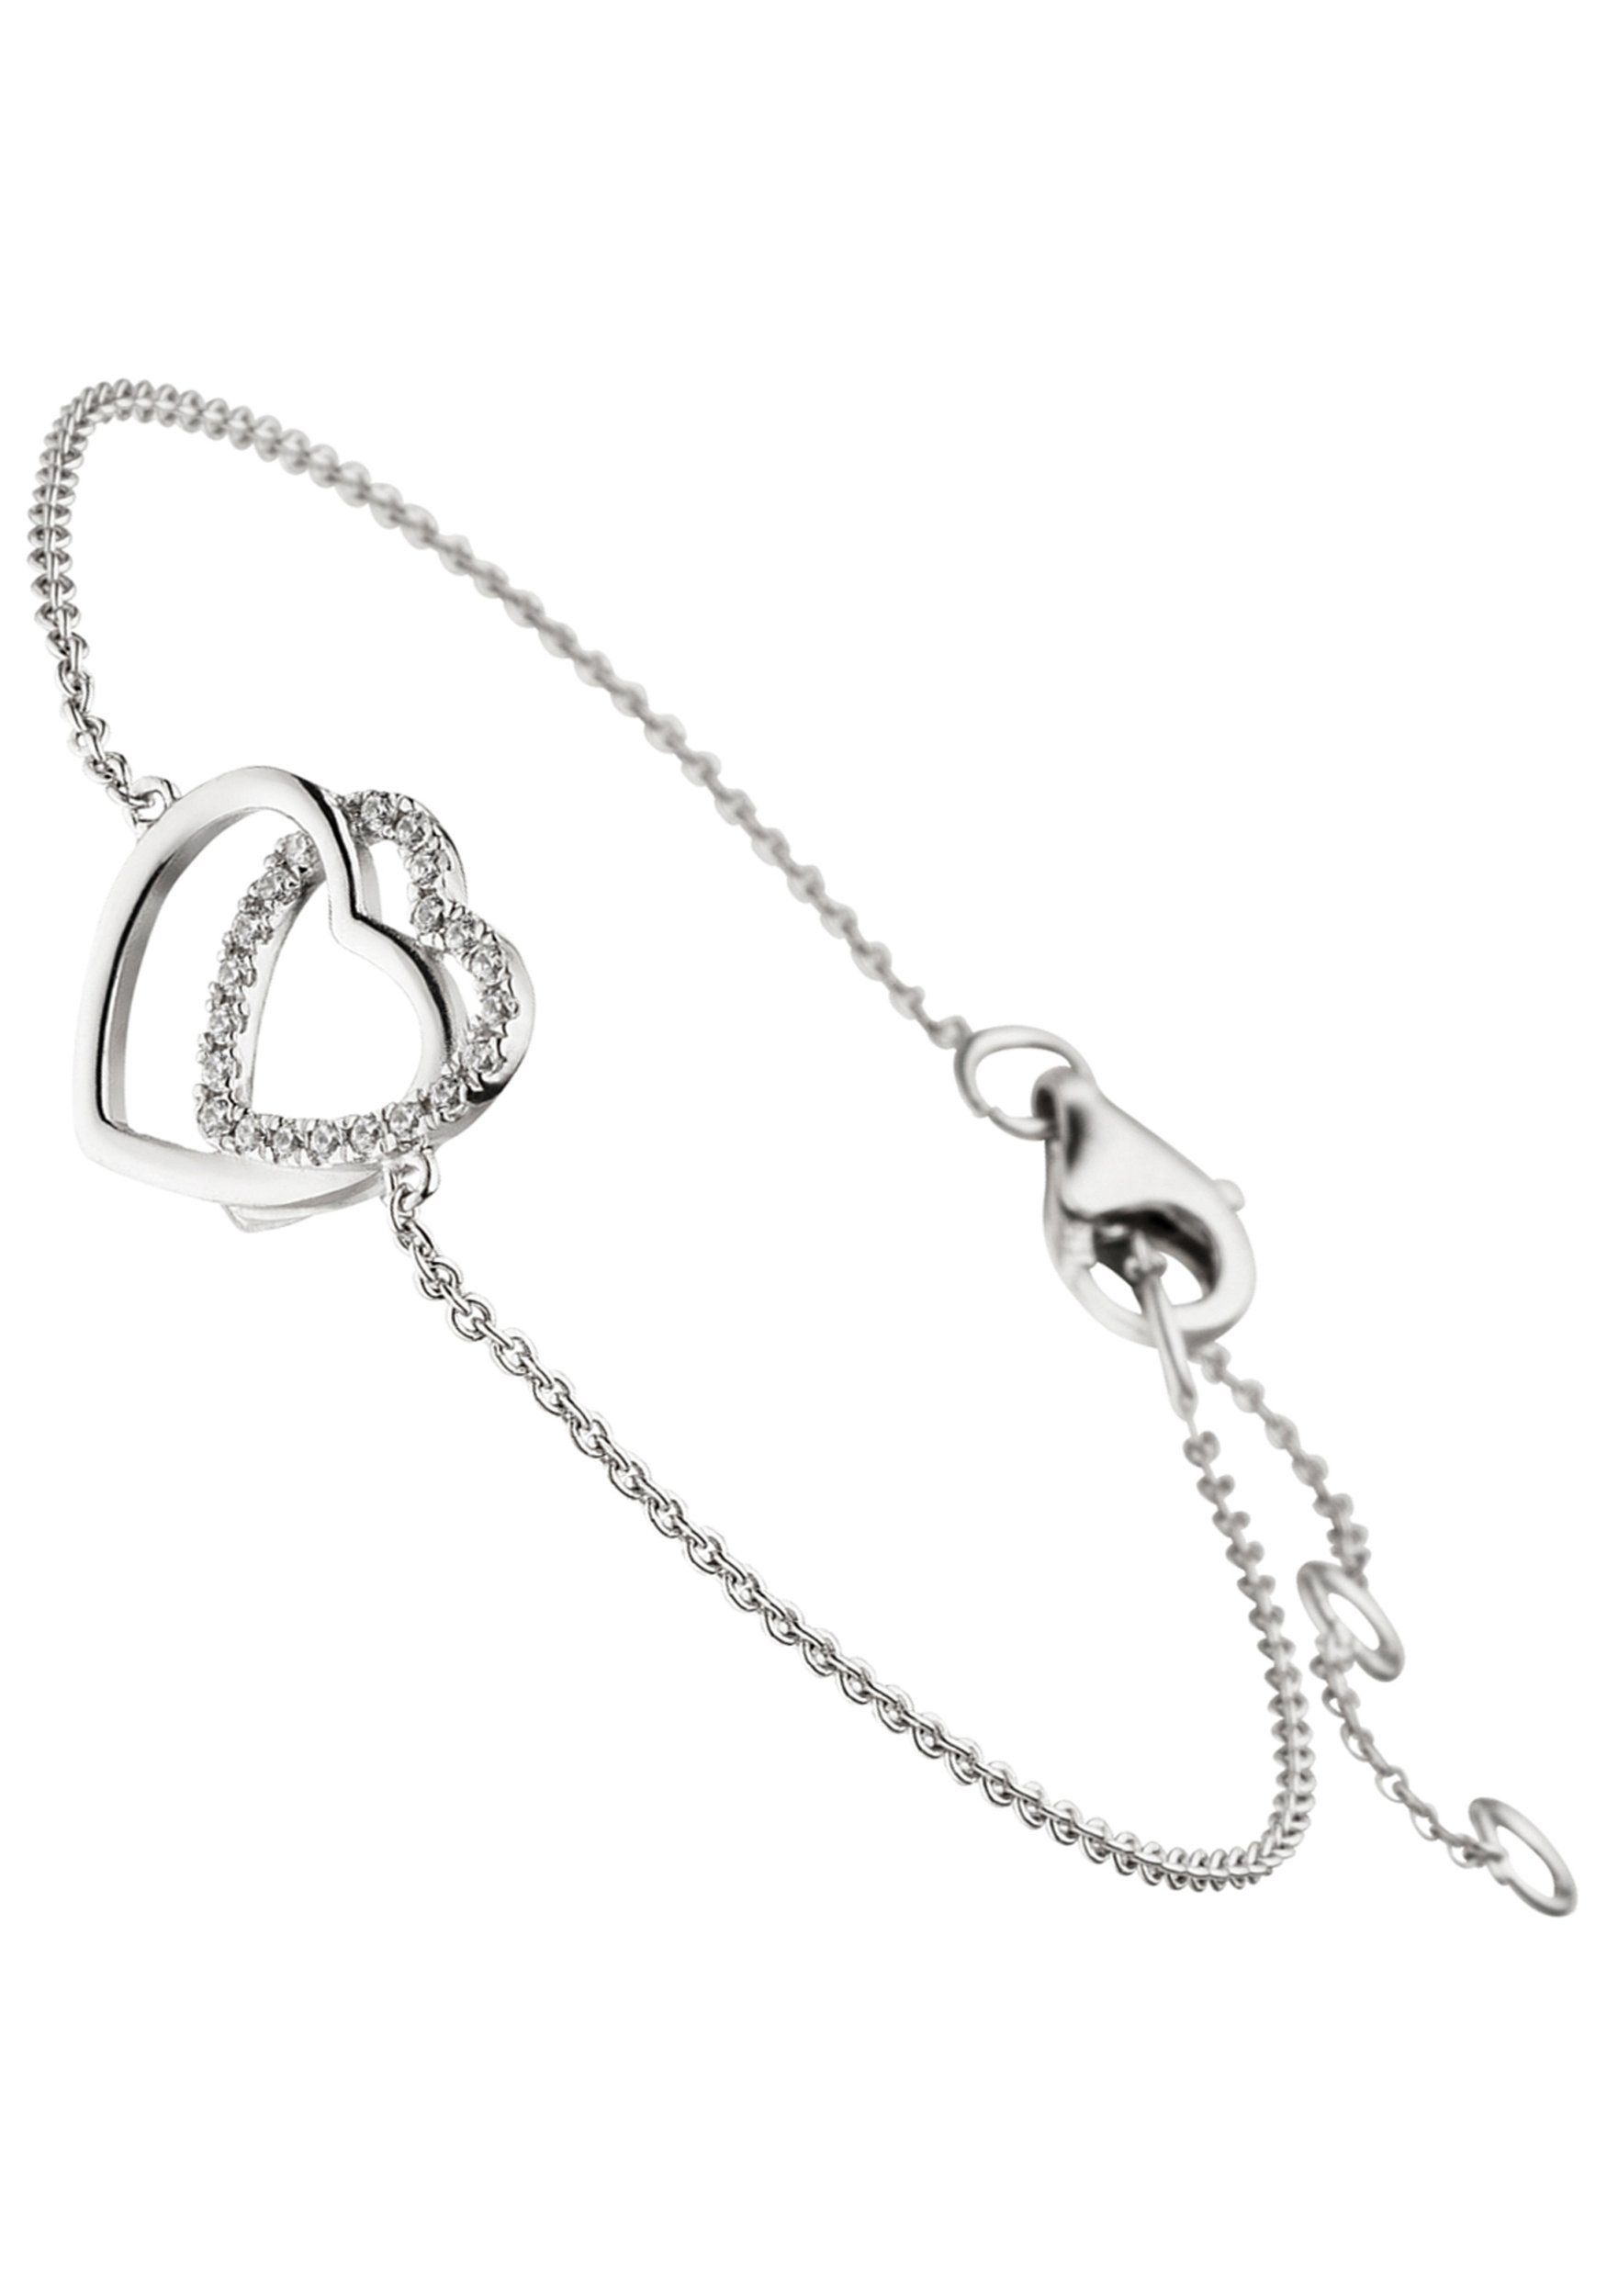 JOBO Silberarmband »Herzen« 925 Silber mit Zirkonia 18 cm